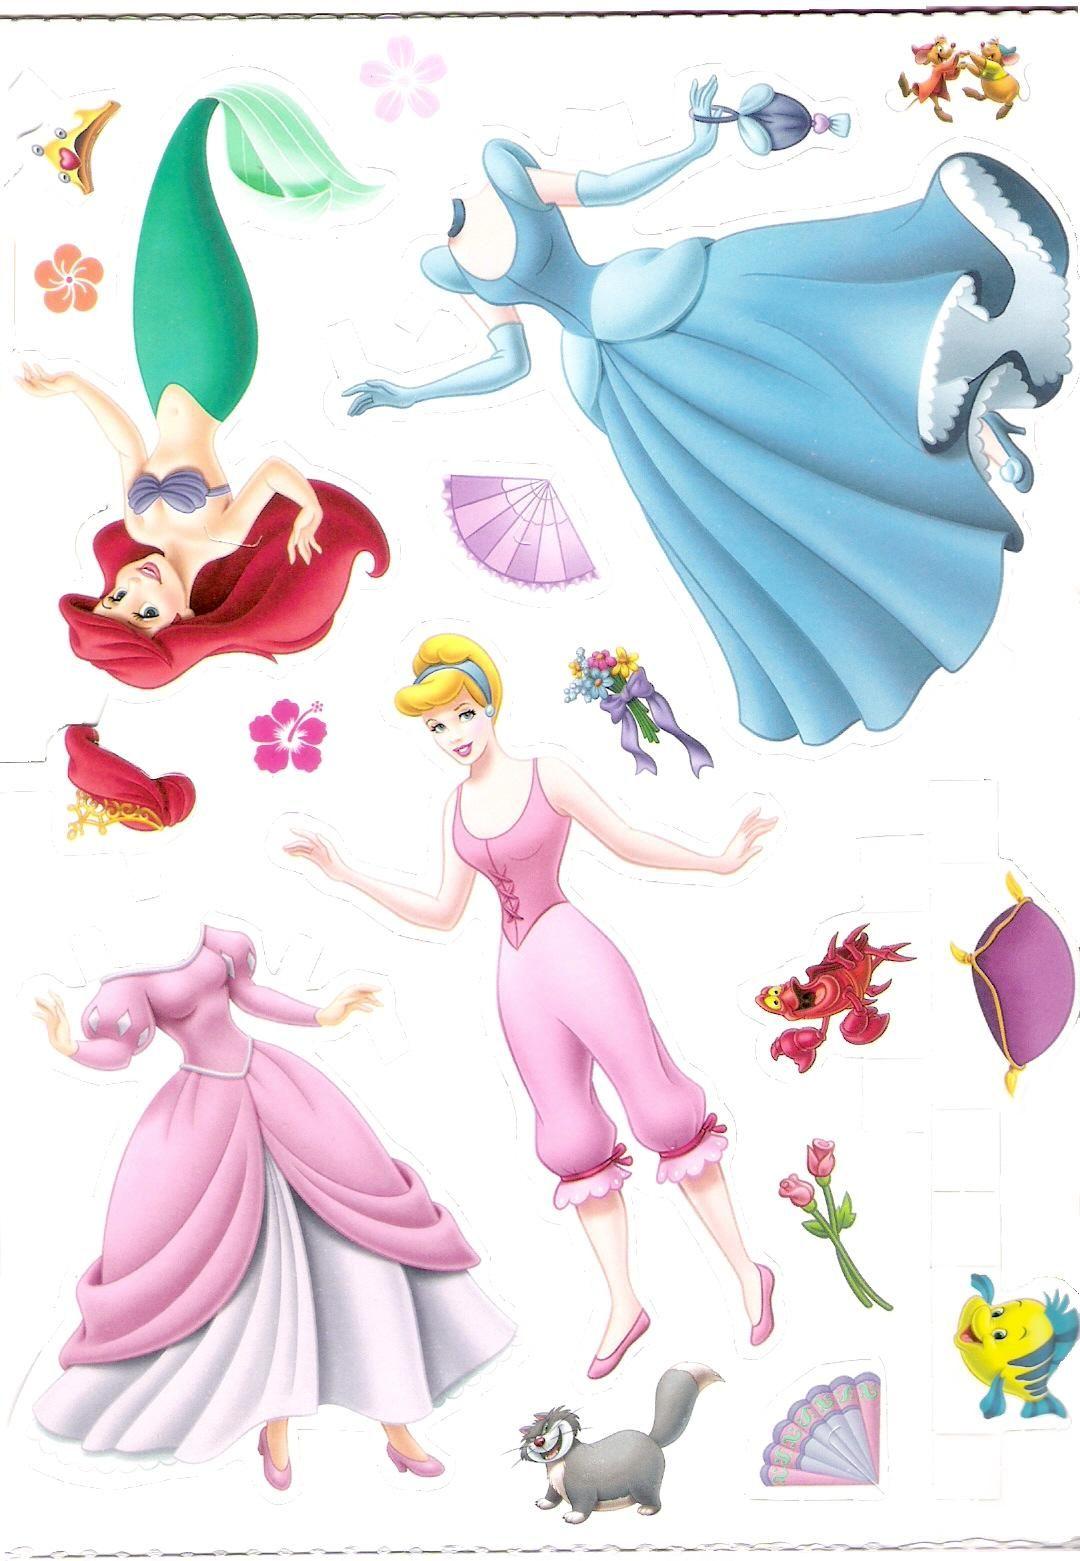 Https Fun With Paper Dolls Googlegroups Com Attach 8cea1d1a9dfc6156 Princess 20pds 20card 20inside 20c Jpg Gda Qj85duyaaac3nbwk Chha Y1 Zabawki Dzieci Papier